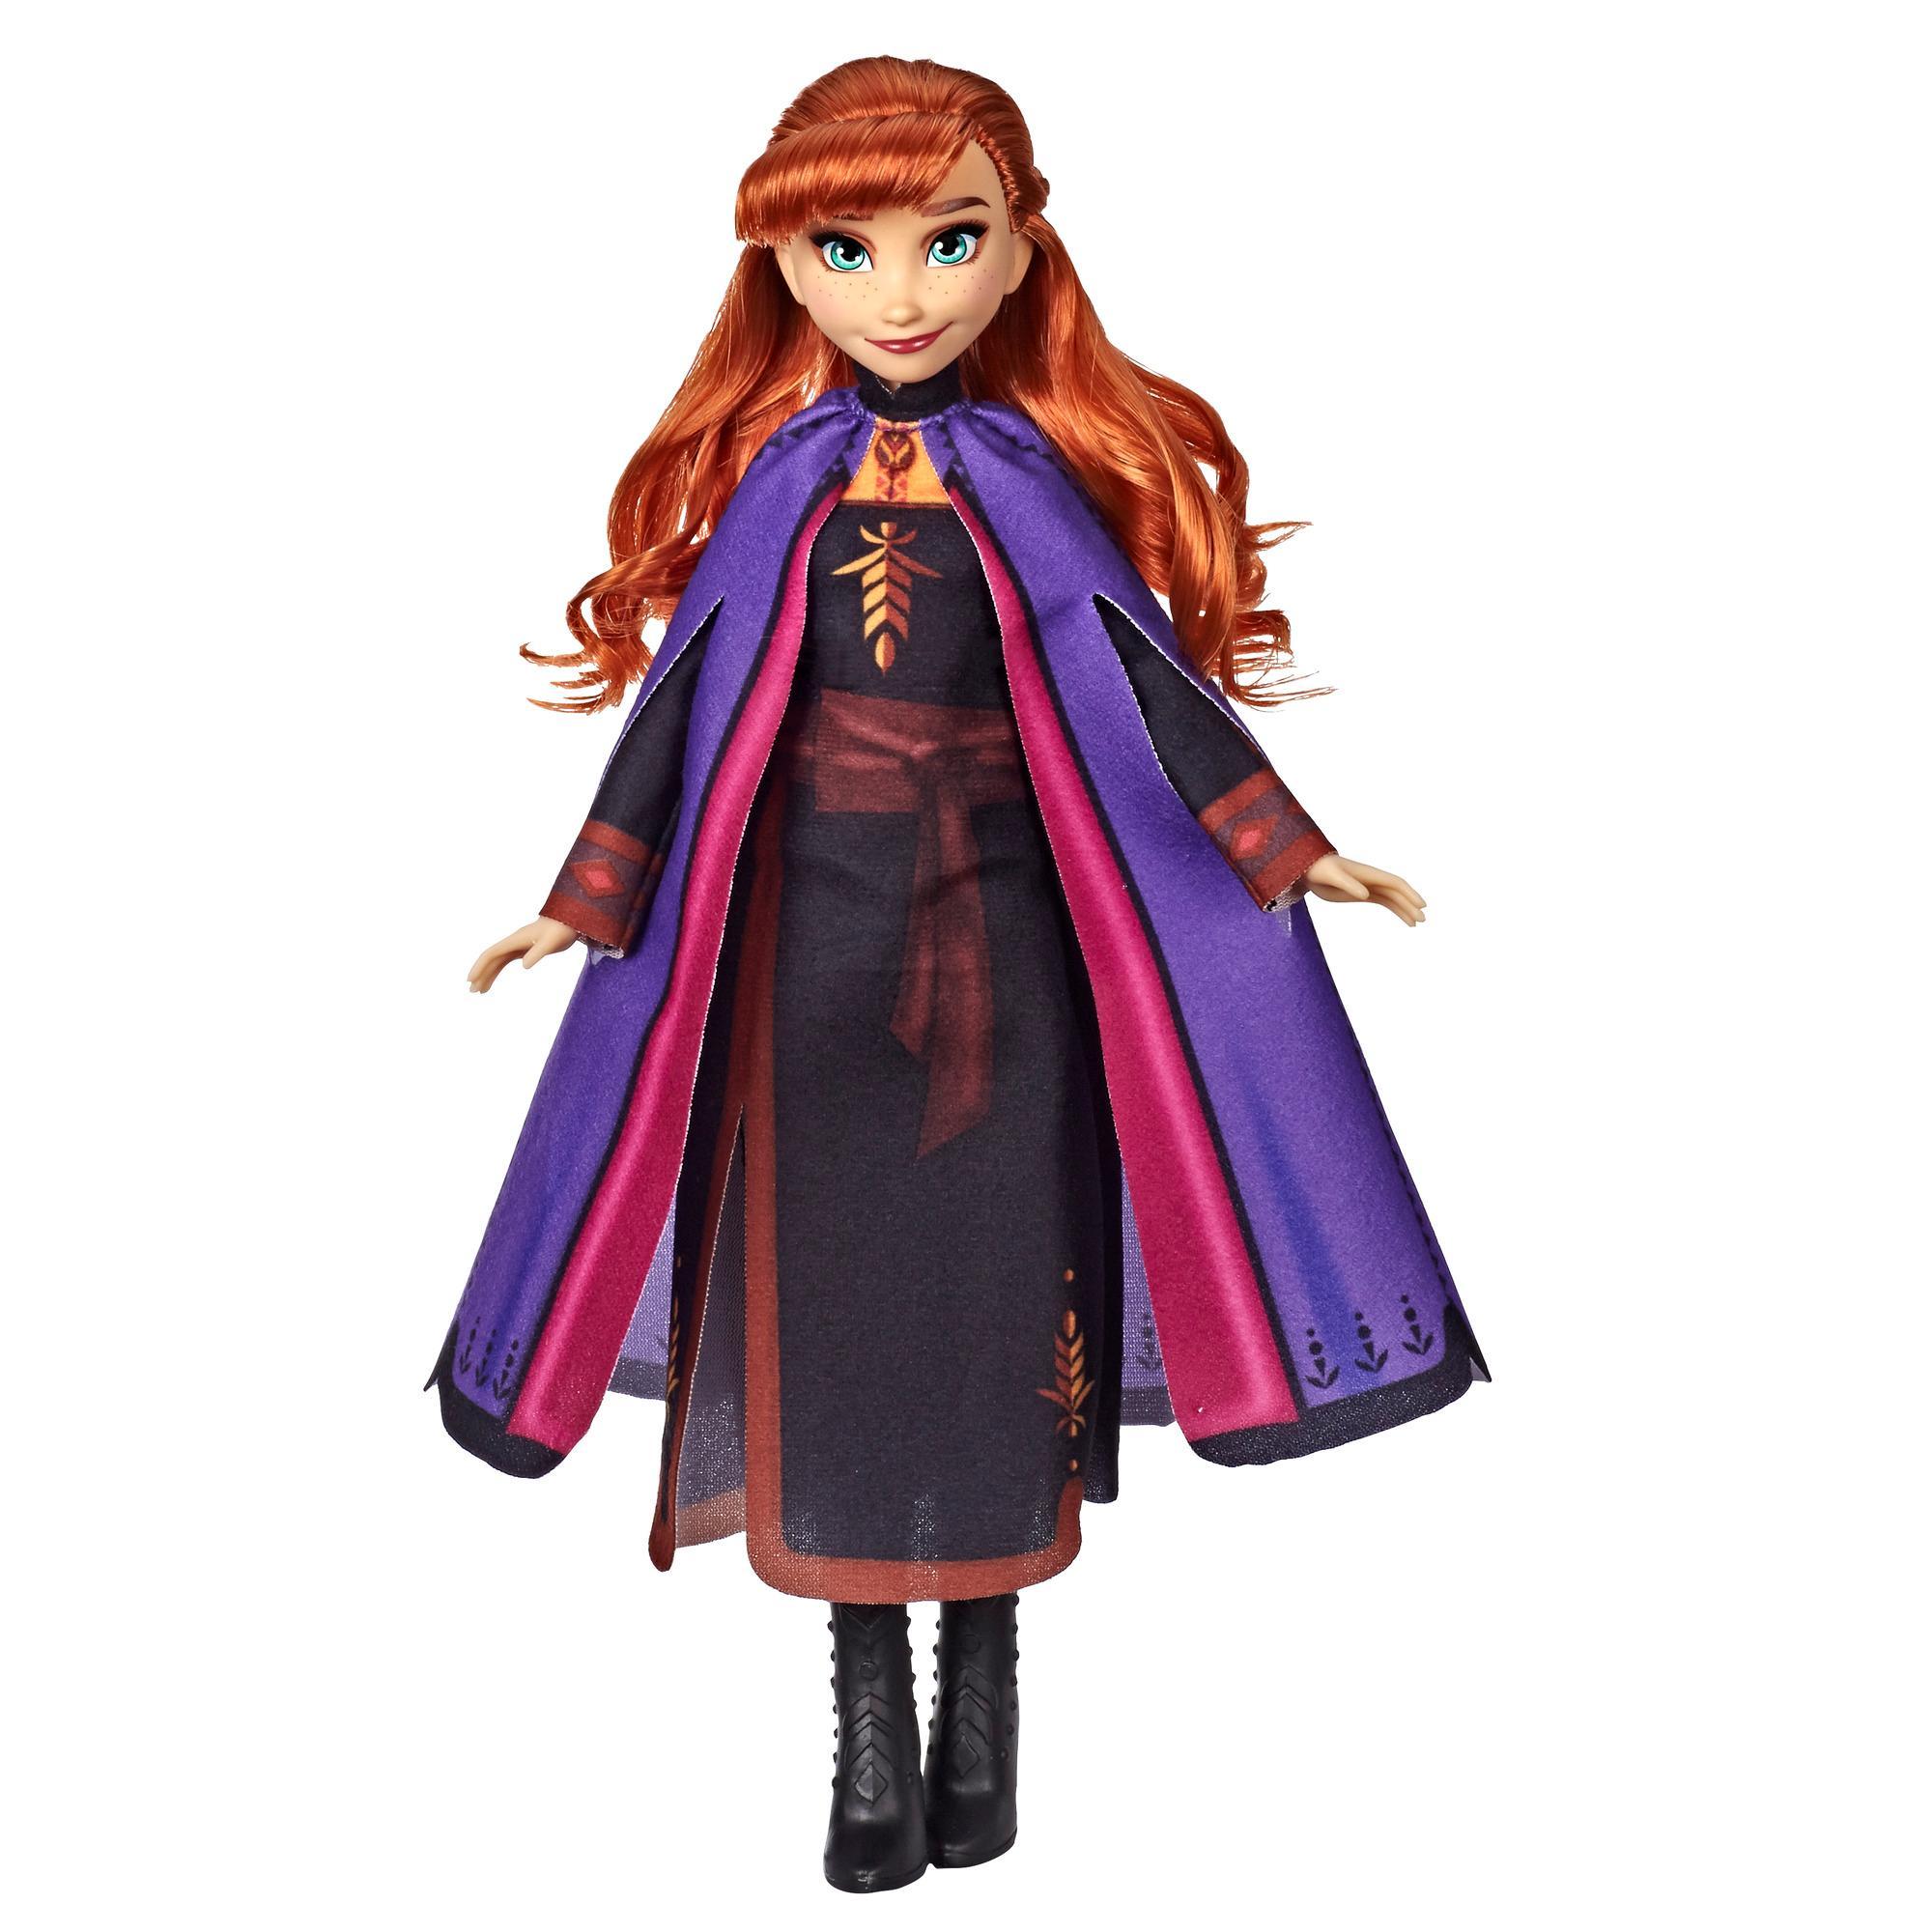 Frozen 2, Άννα - Κούκλα